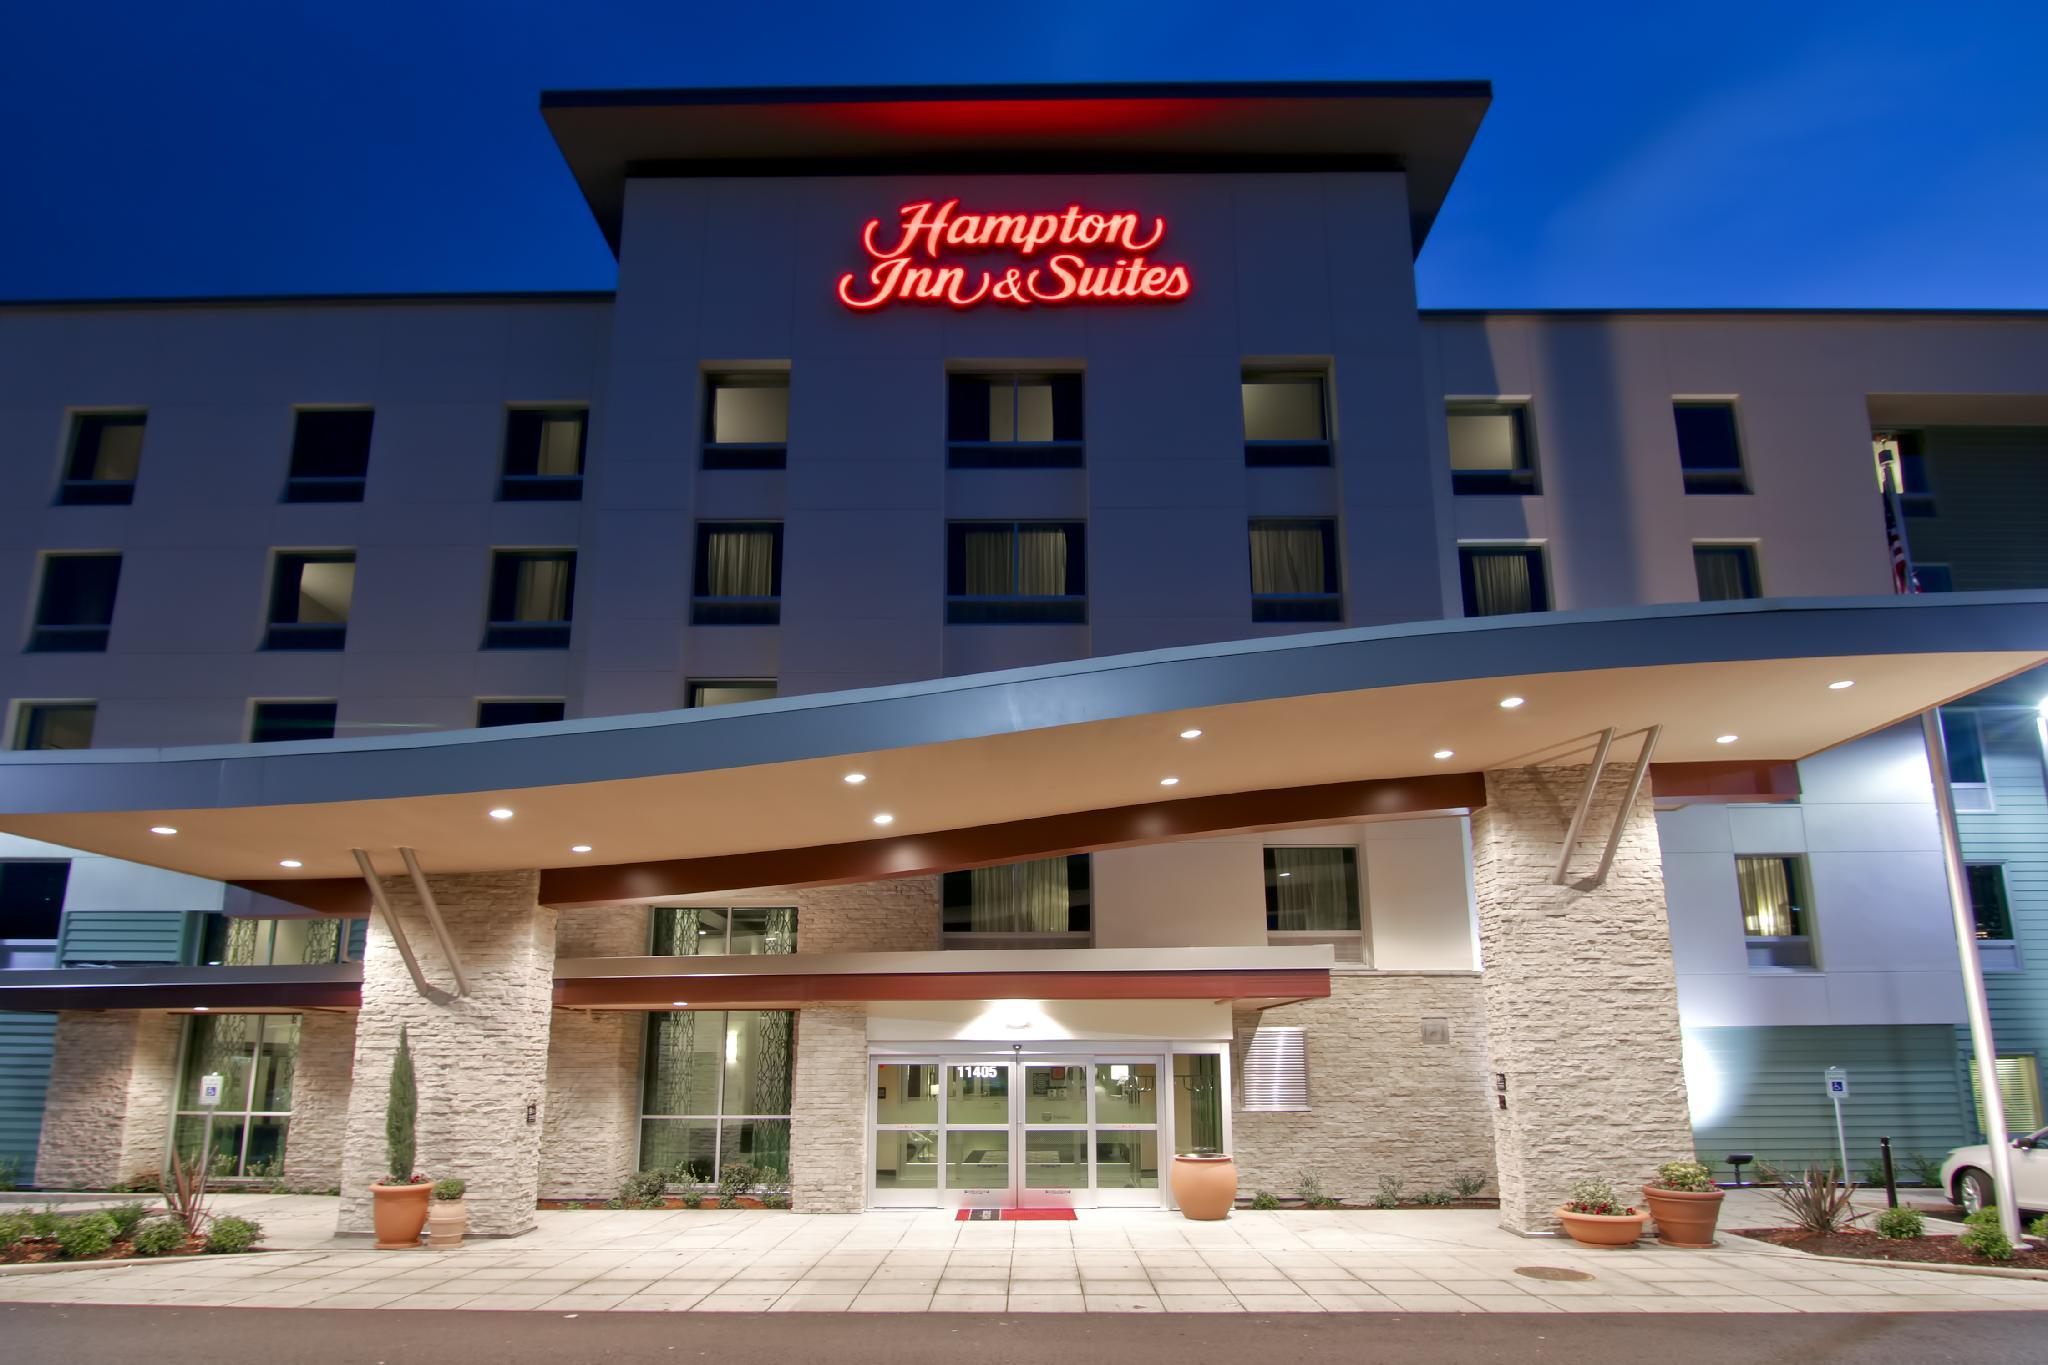 Hampton Inn And Suites Seattle Bellevue Downtown